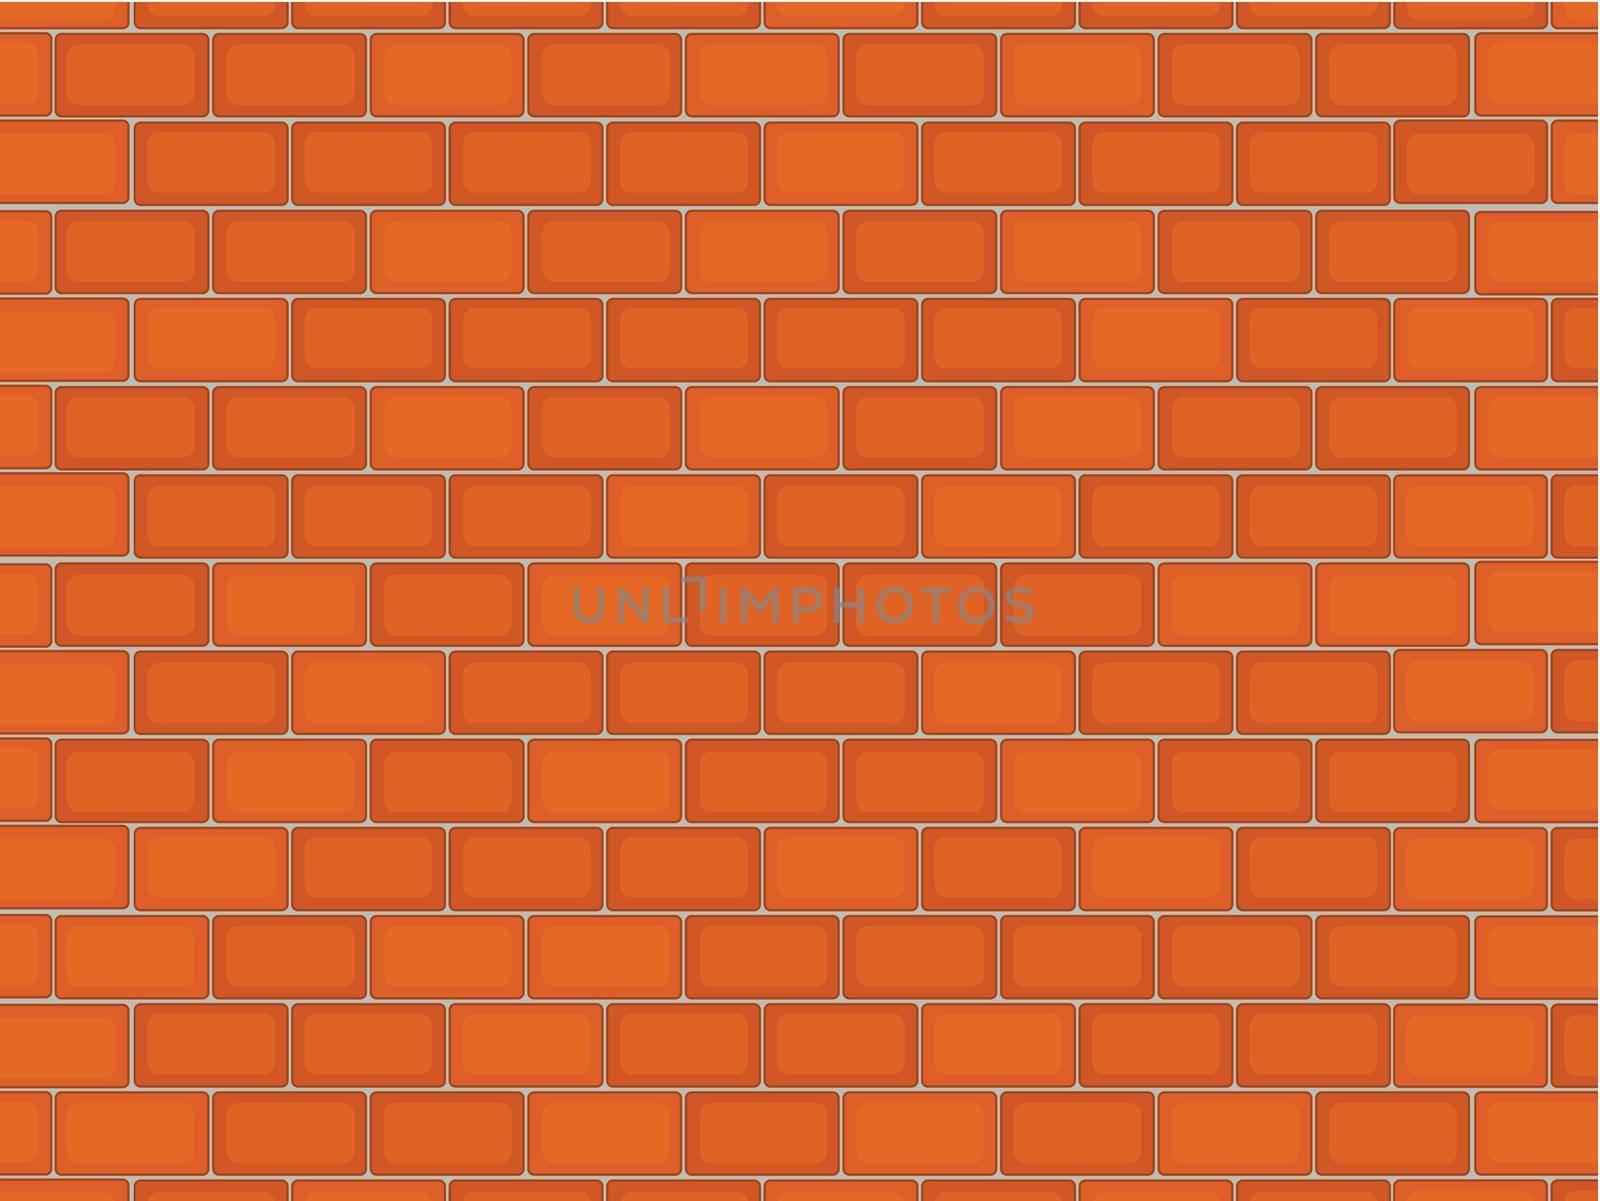 Illustration of a brick texture